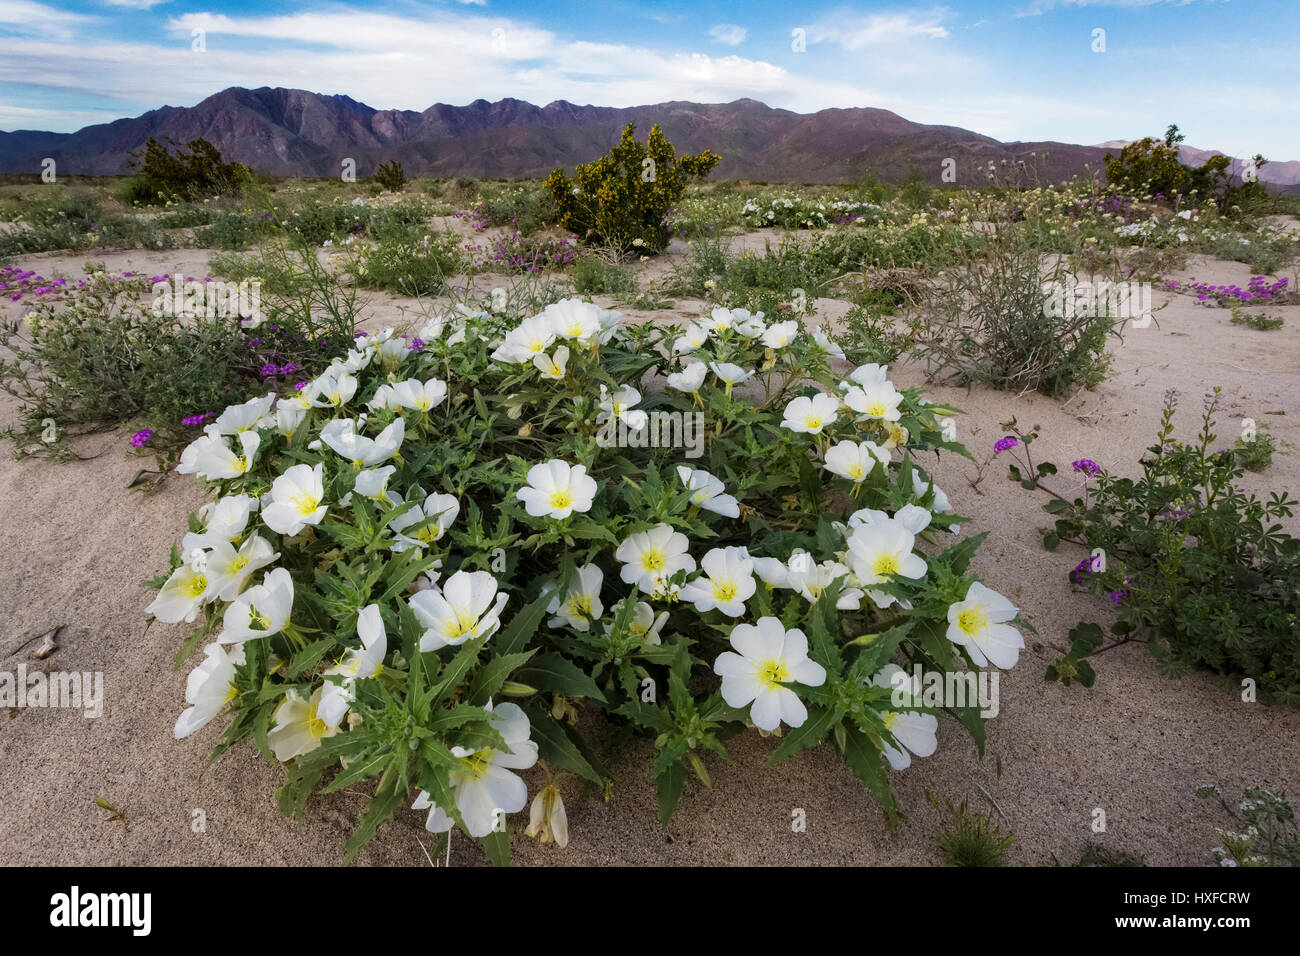 Dune primrose (Oenothera deltoides ssp. deltoides/Onagraceae) blooming in Anza-Borrego Desert State Park, California, - Stock Image